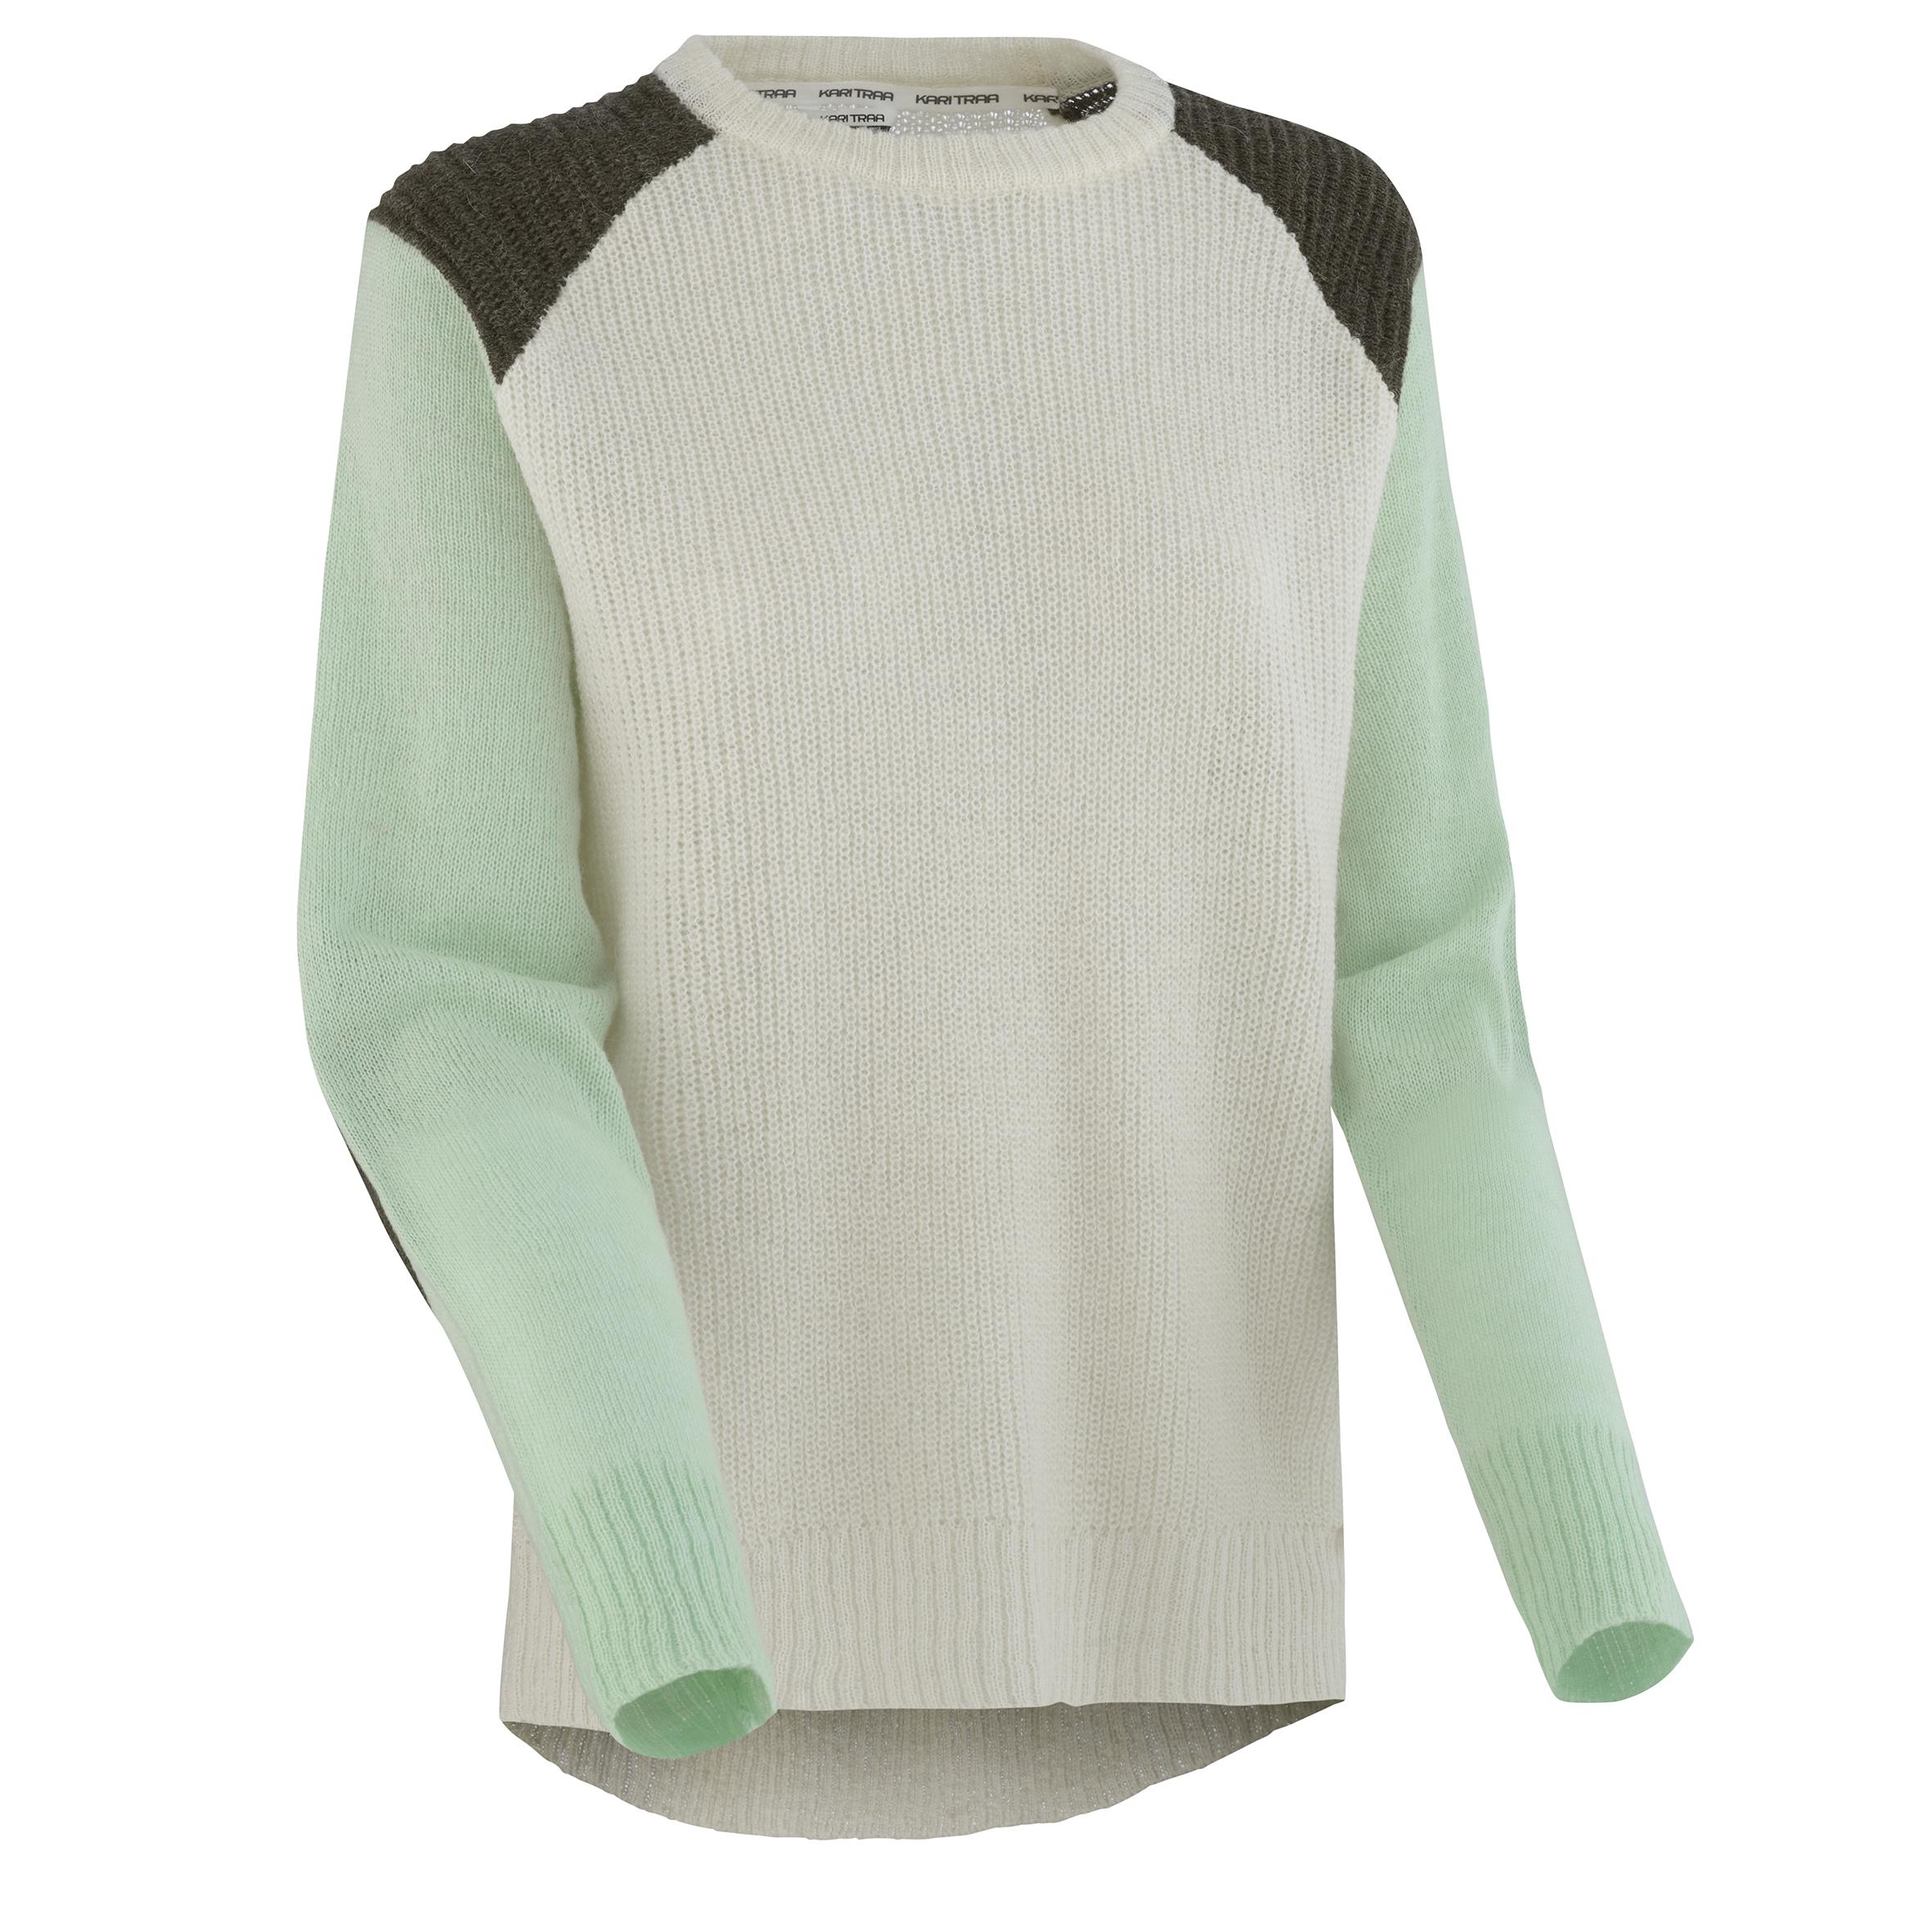 Kari Traa, Fære trøje, minty, medium